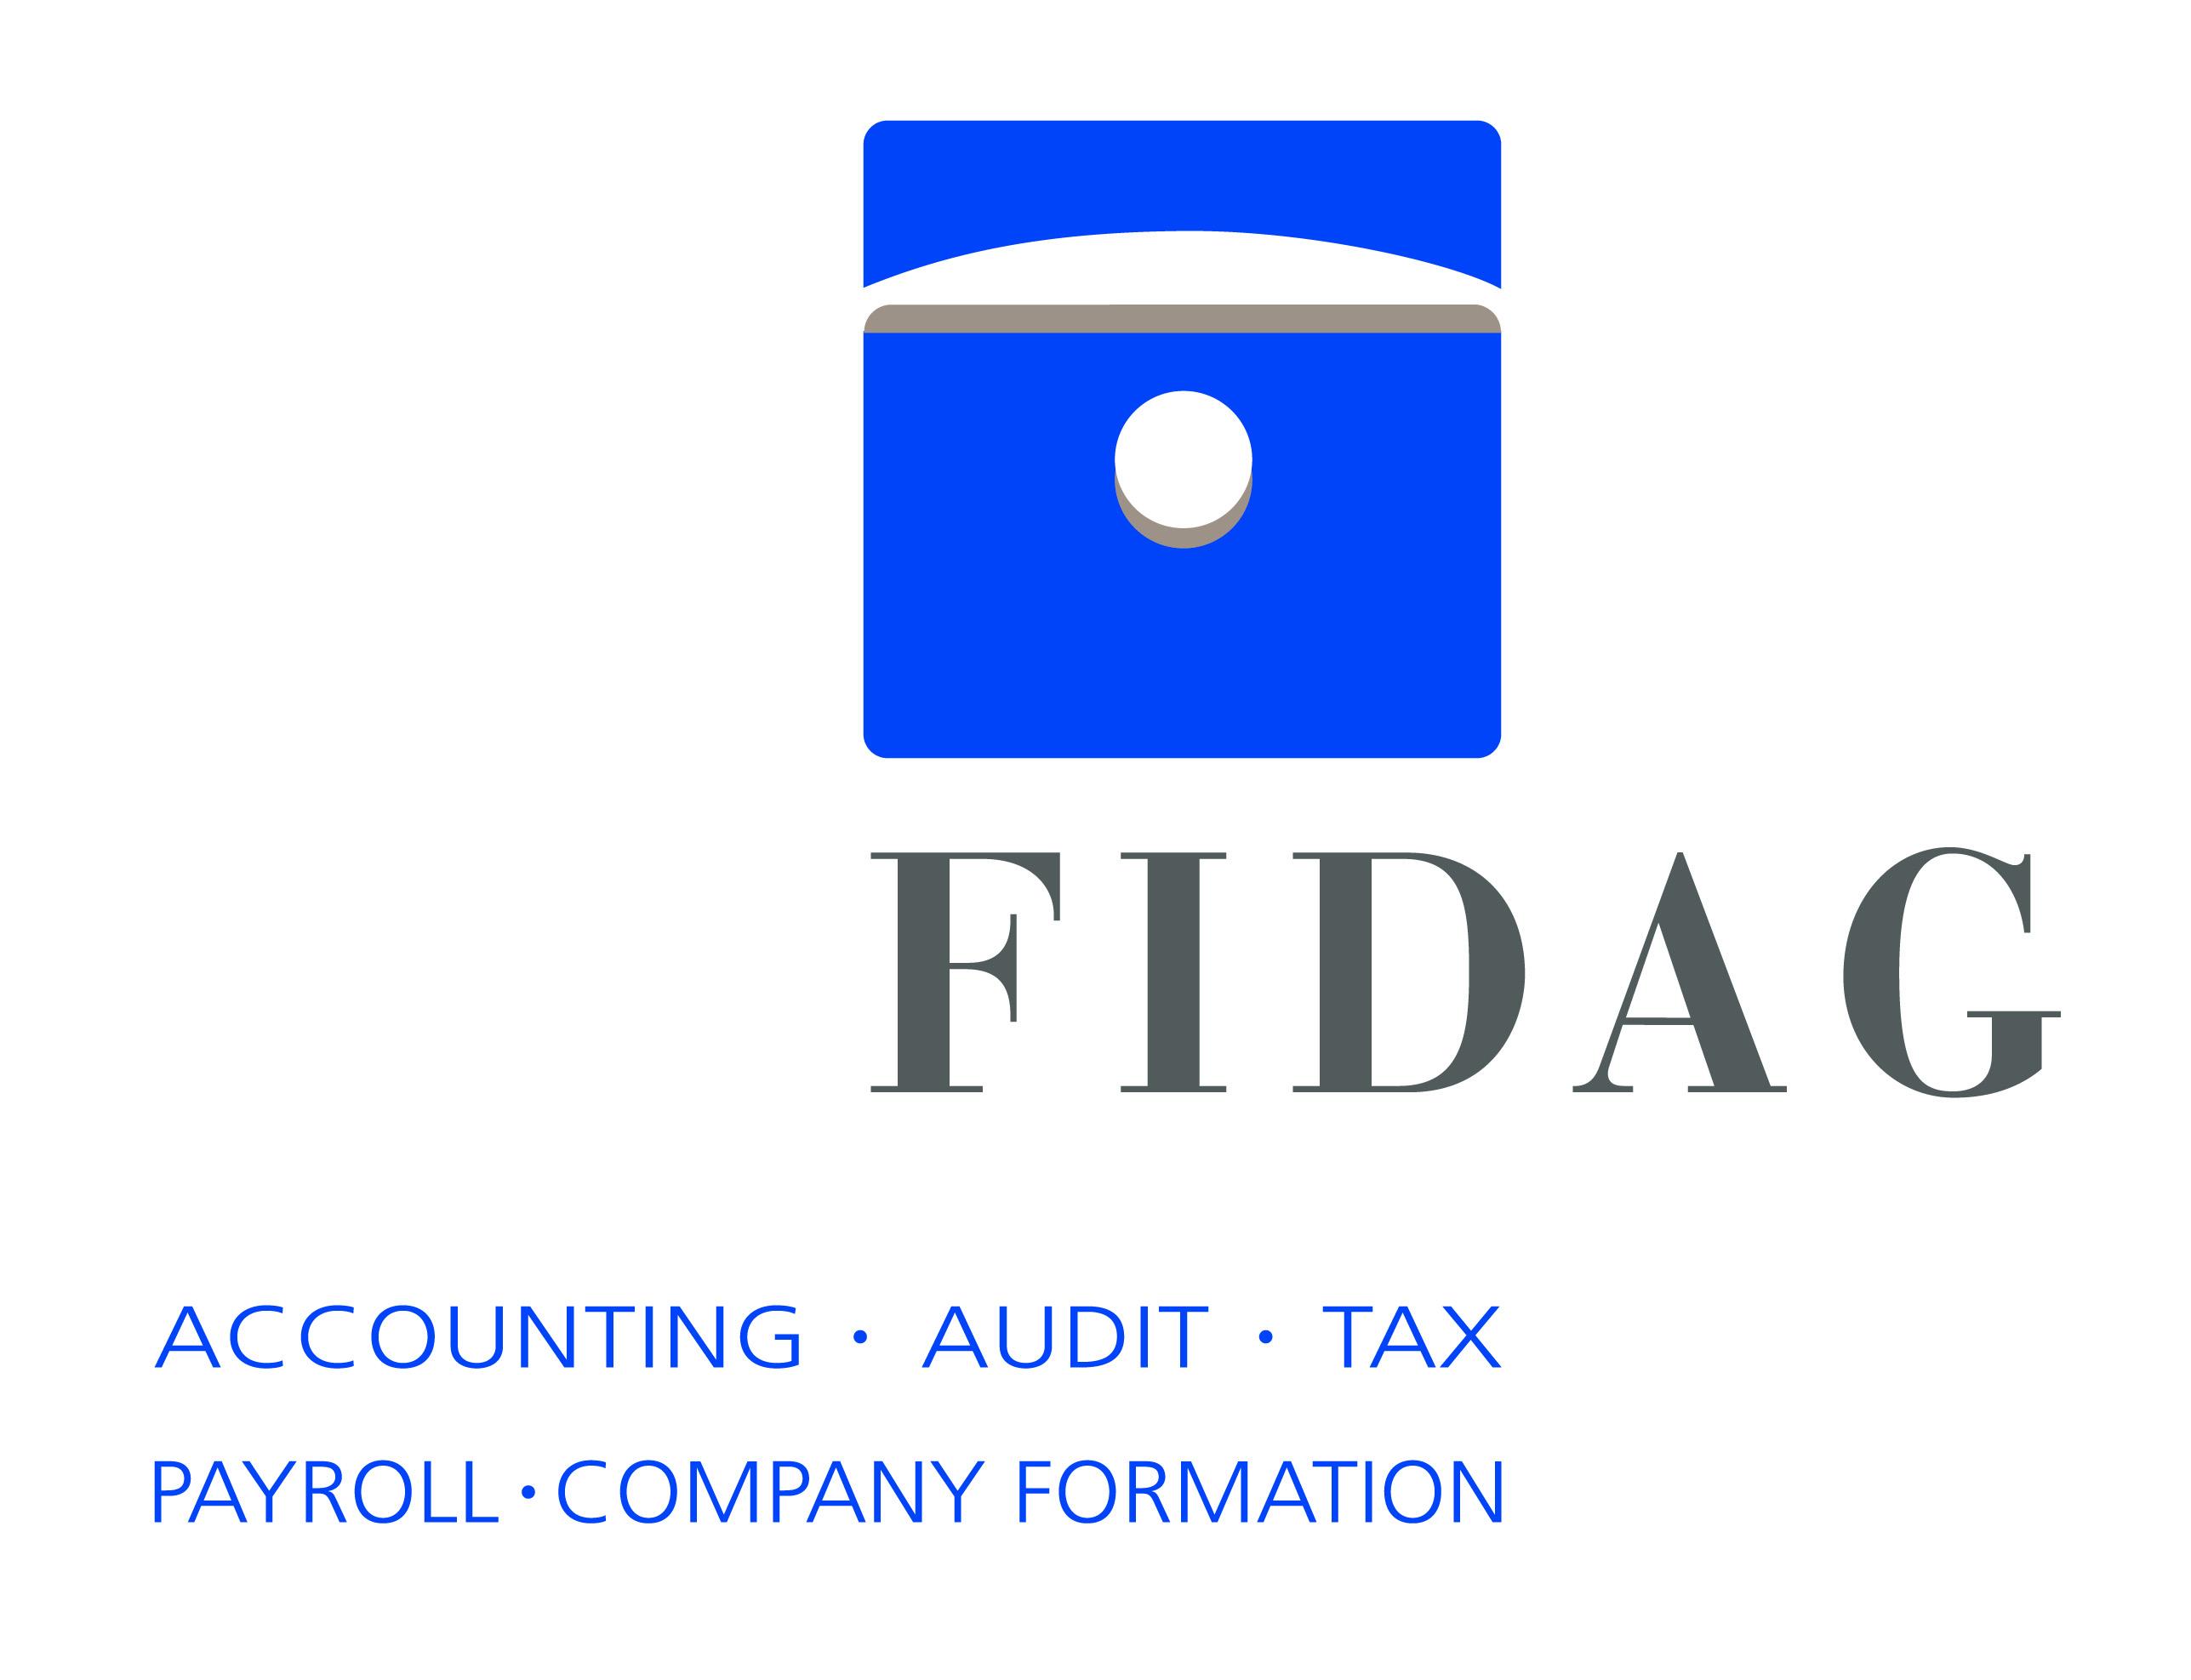 FIDAG logo